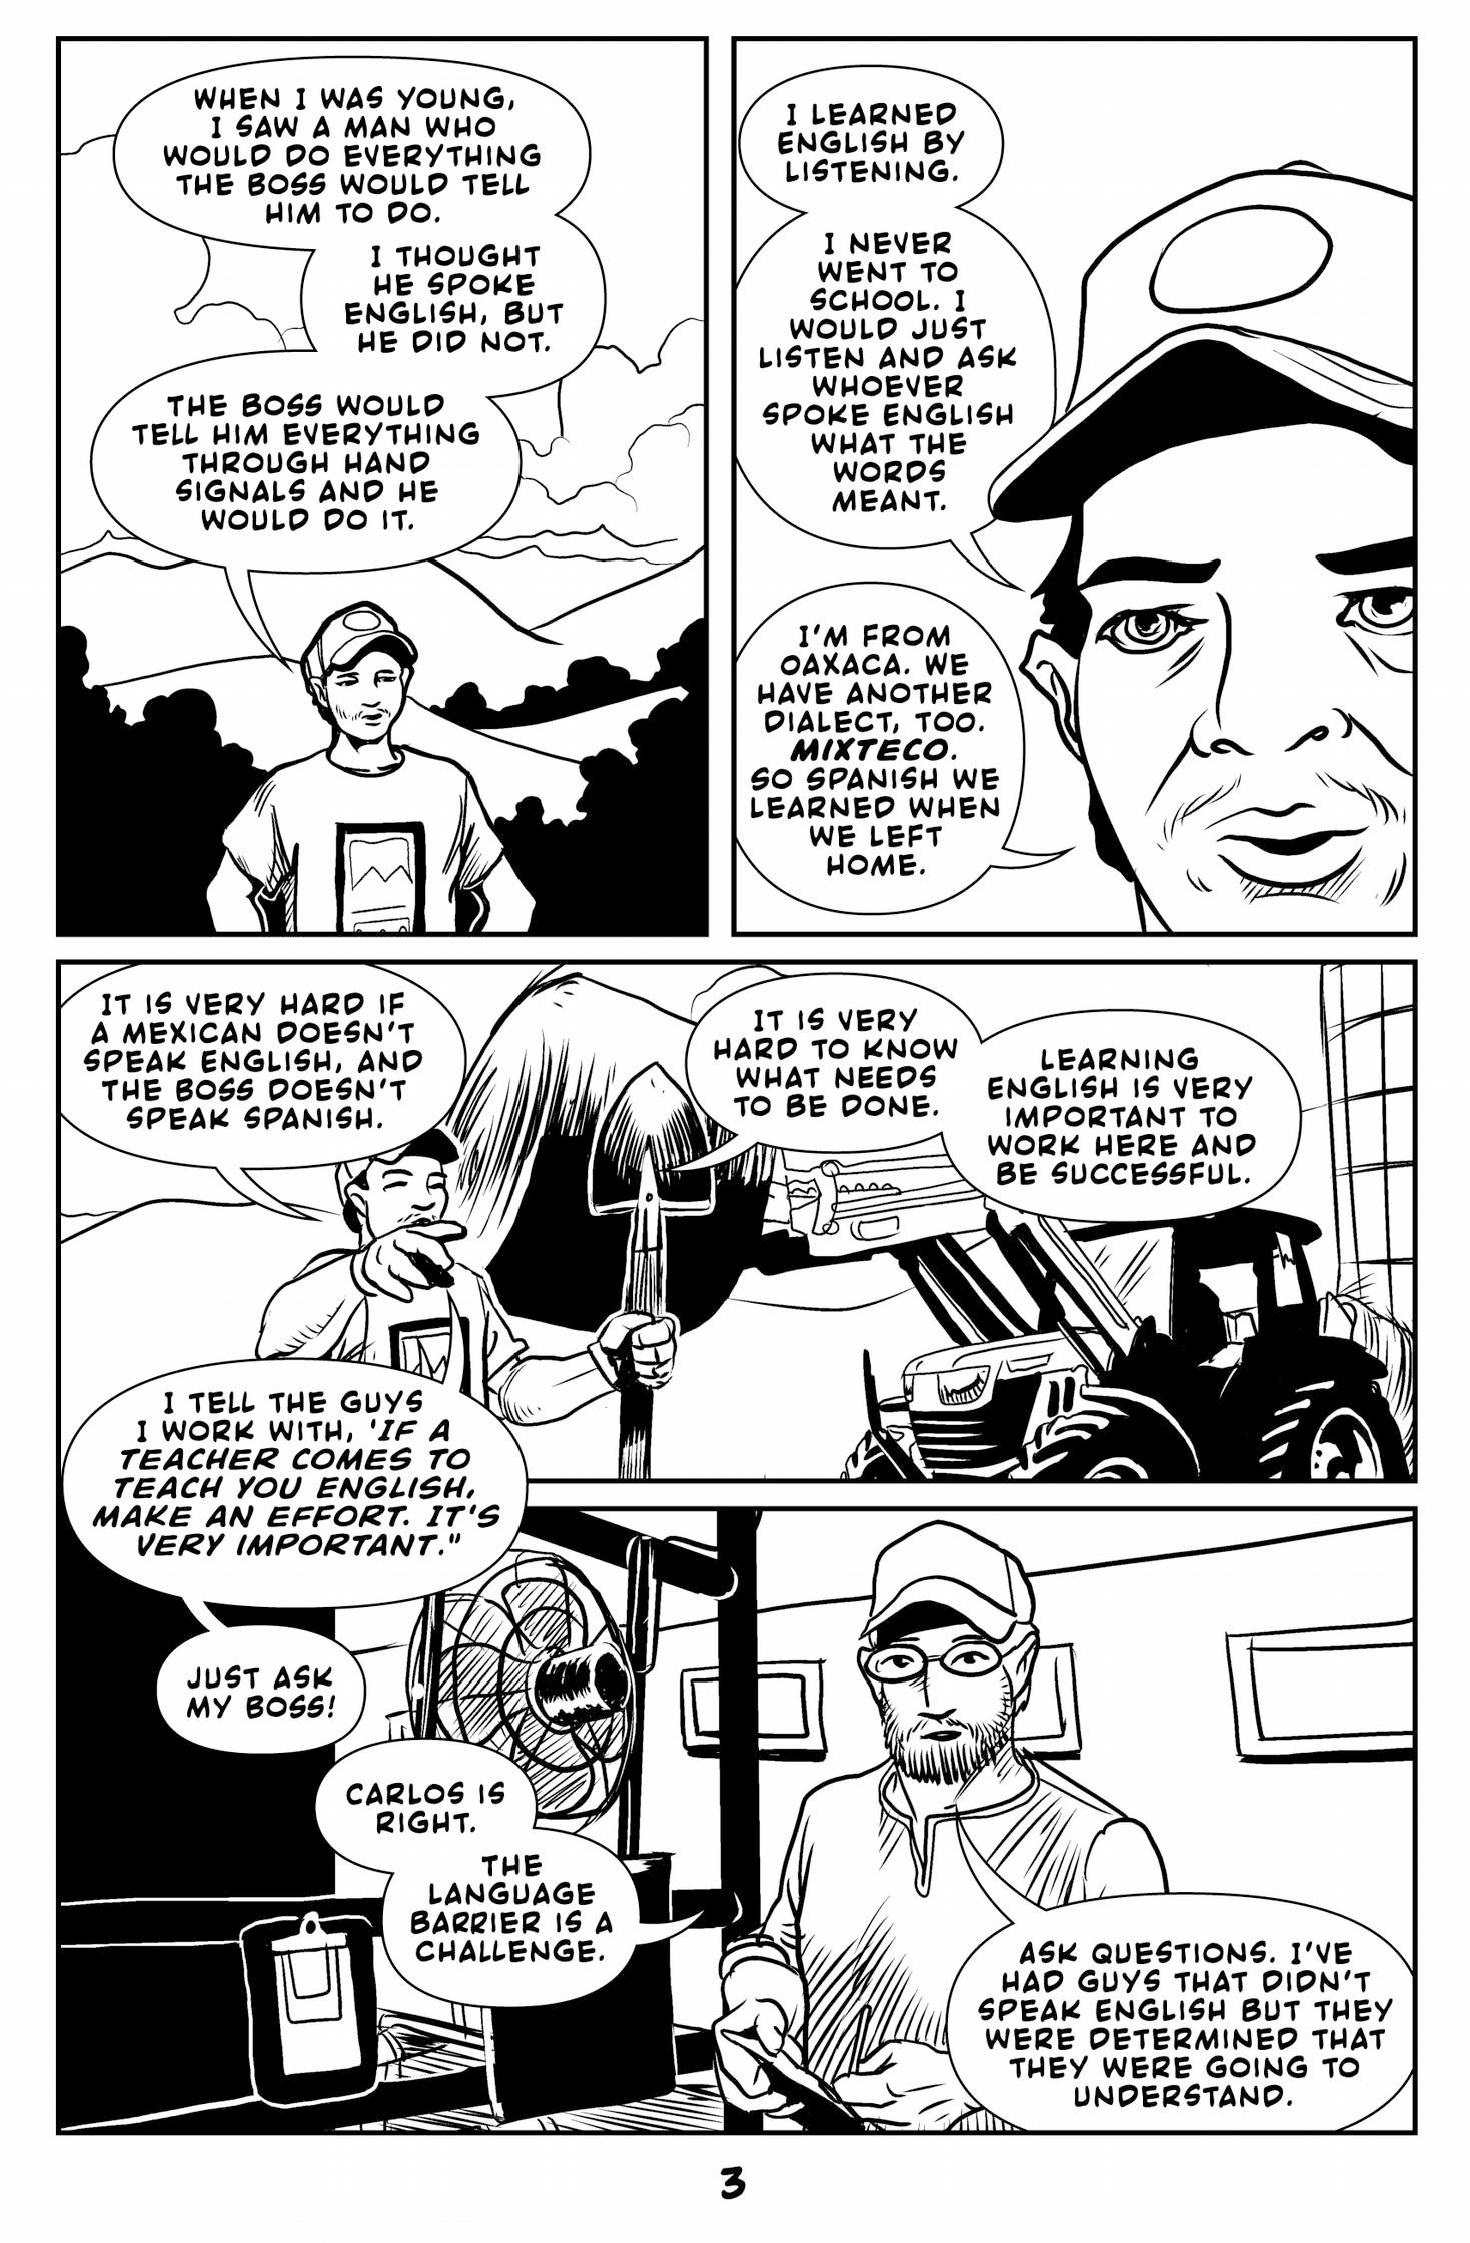 BOOKLET-170400_Carlos+Bob_Ezra_Digest_ENG-8page 4.png